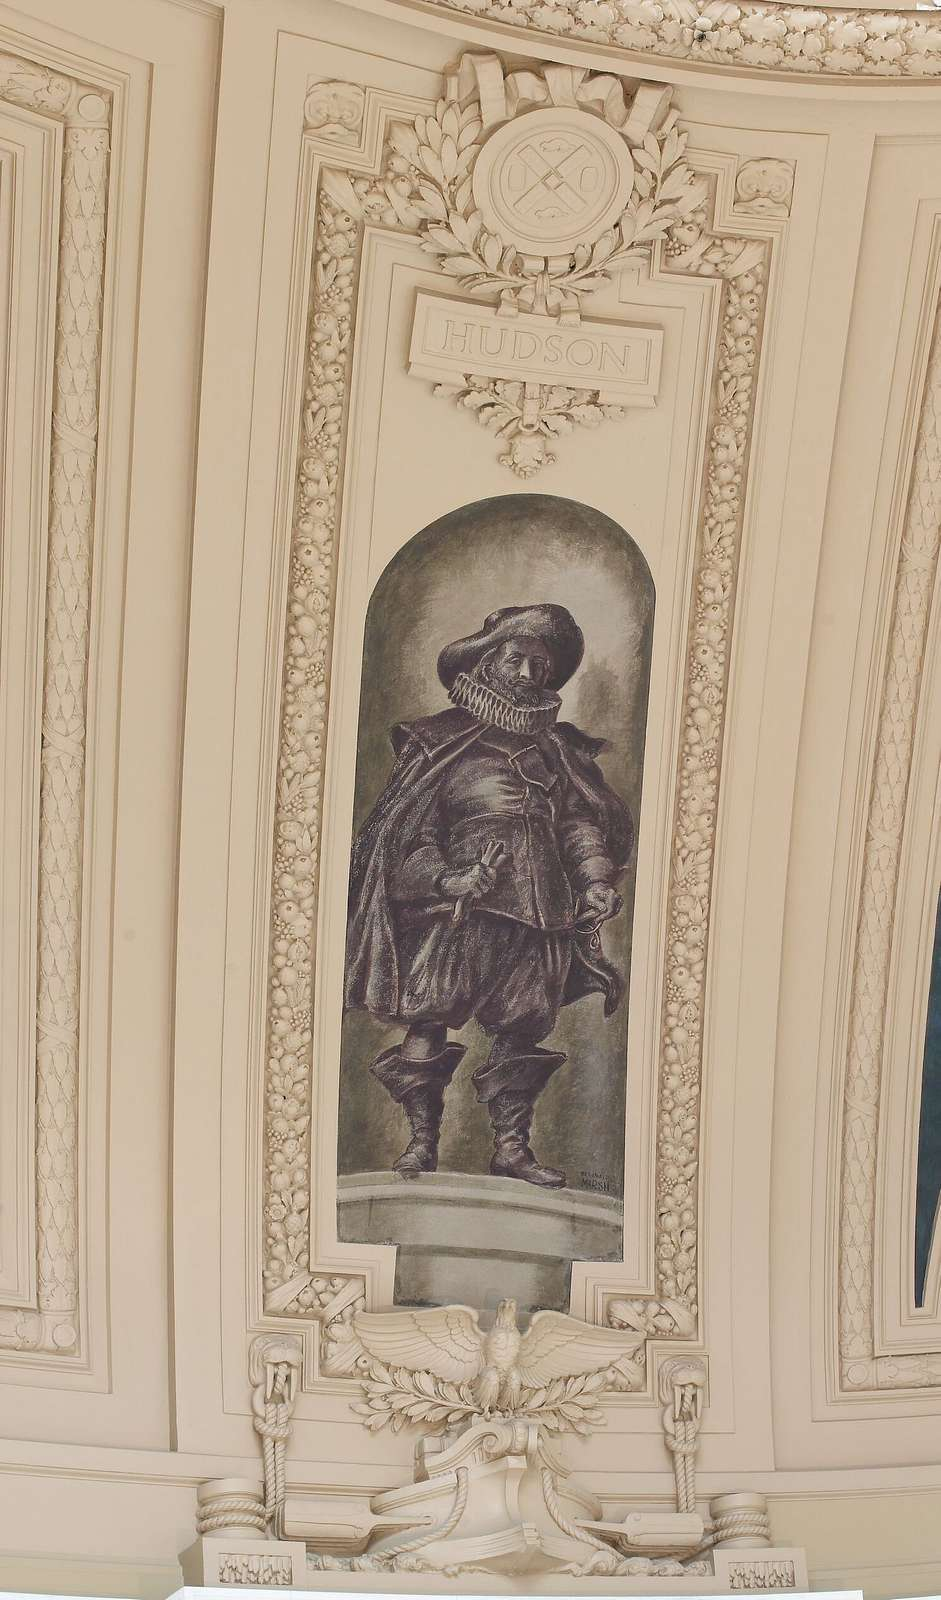 "Fresco painting ""Explorer Hudson"" located in rotunda of Alexander Hamilton U.S. Custom House, New York, New York"